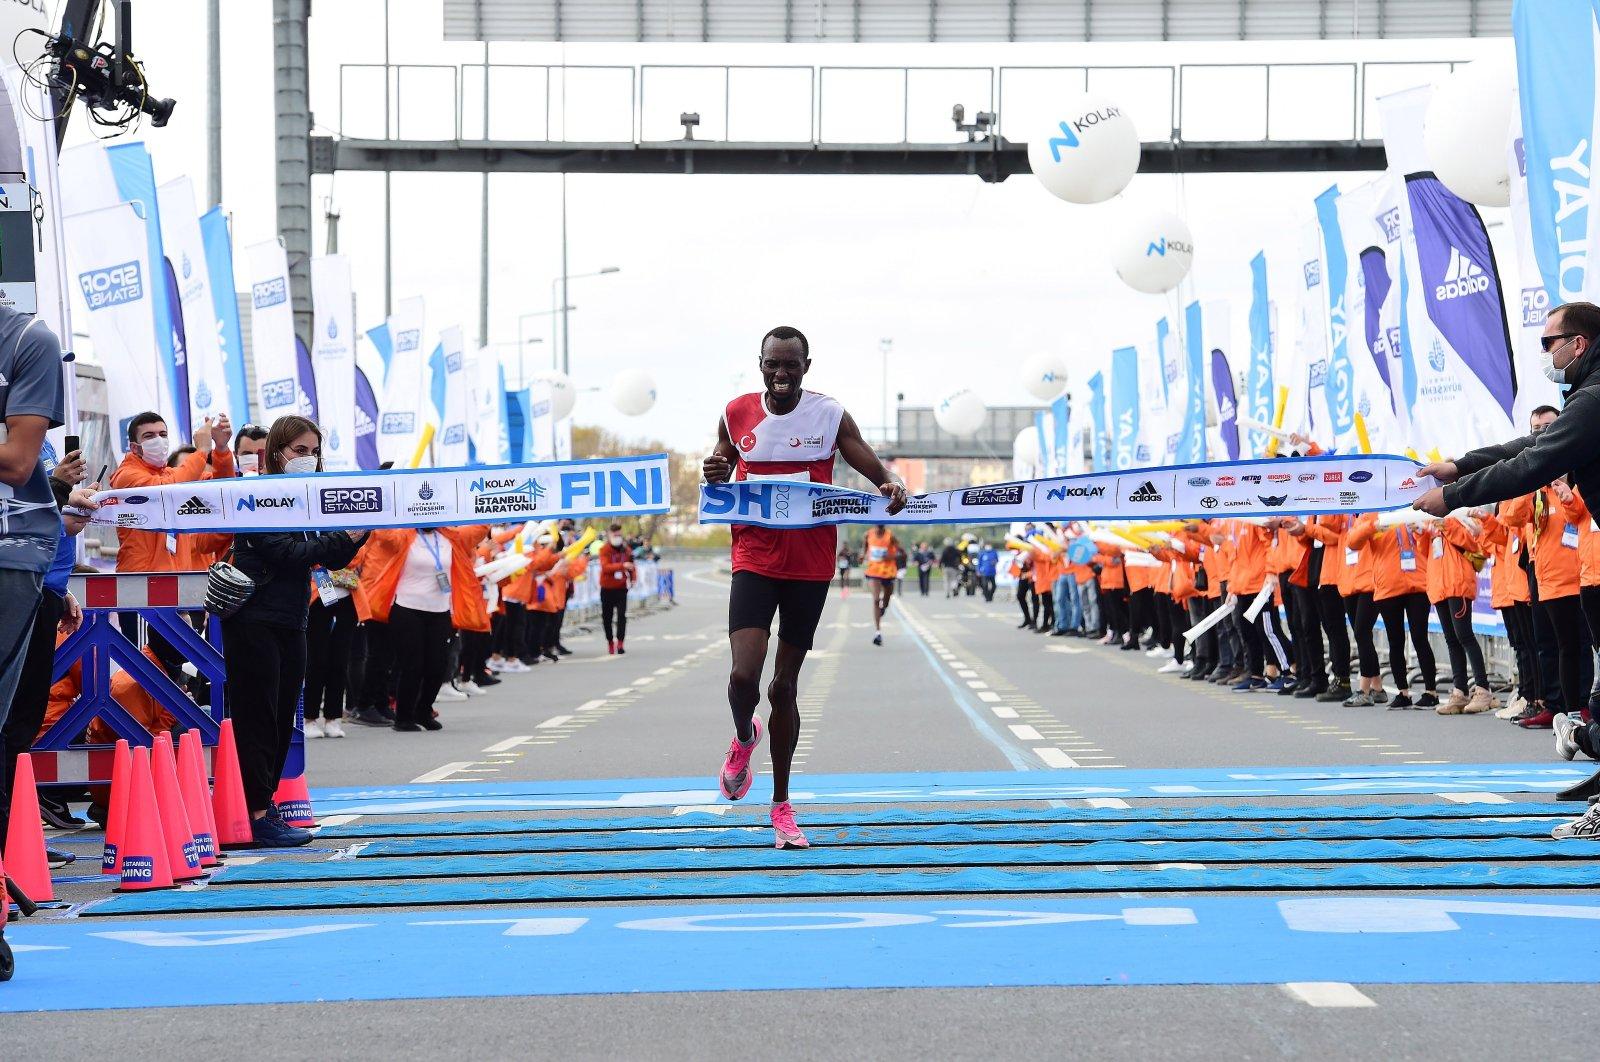 Benard Cheruiyot Sang, winner of the marathon in the men's category, arrives at the finish line, in Istanbul, Turkey, Nov. 8, 2020.  (İHA Photo)